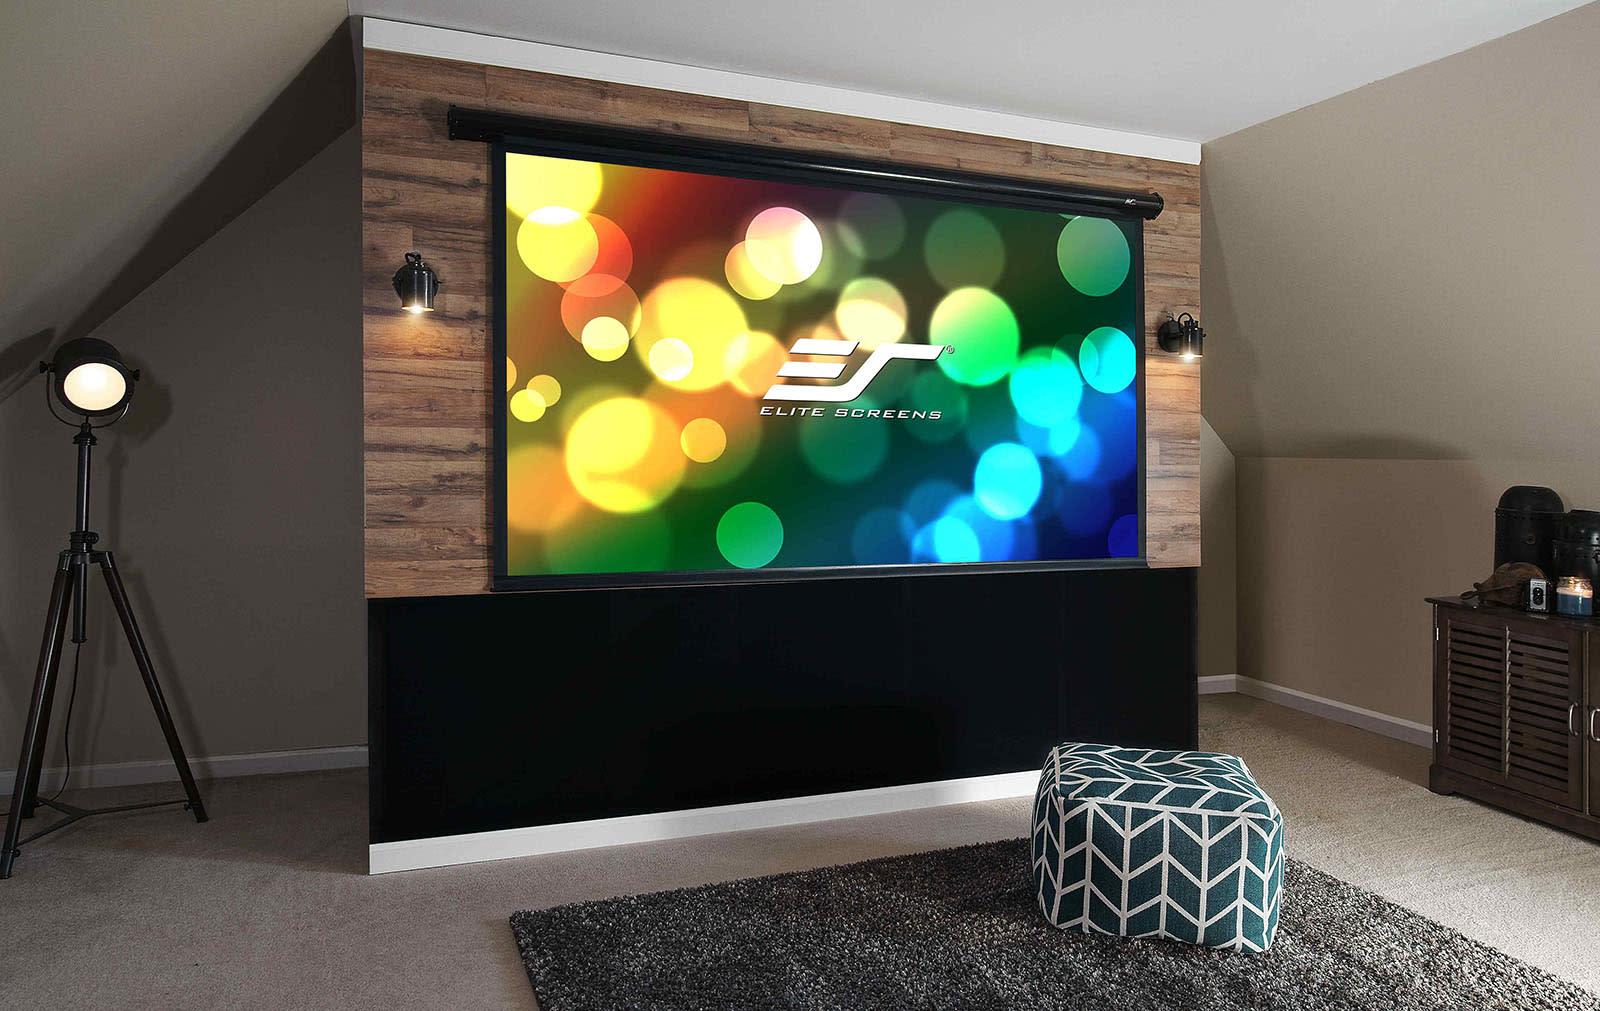 Elite Starling 2 motorized projection screen